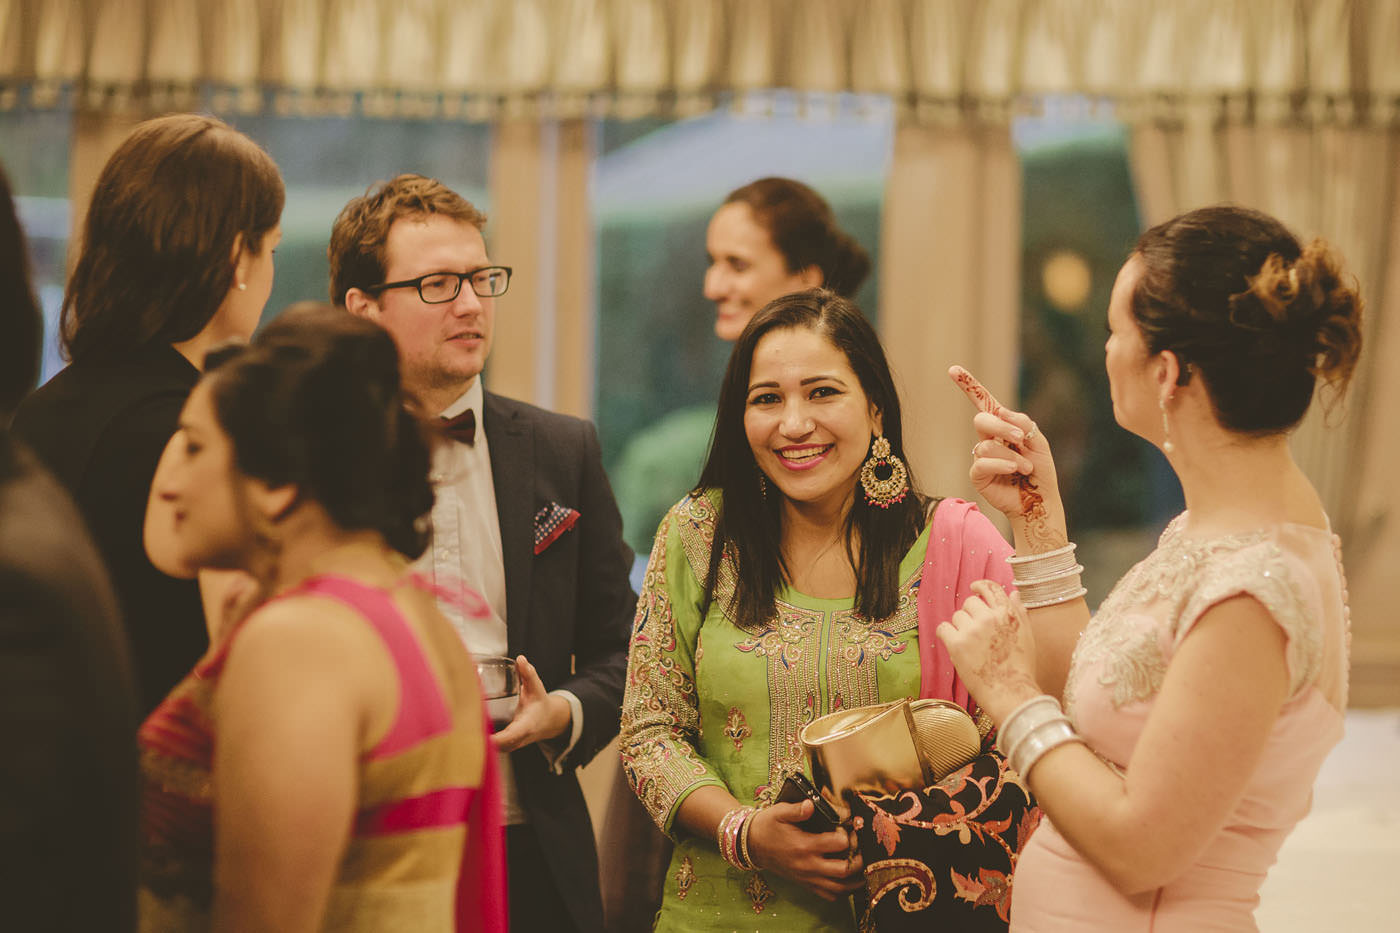 edmundjasveen burford bridge hotel wedding photographer 0078